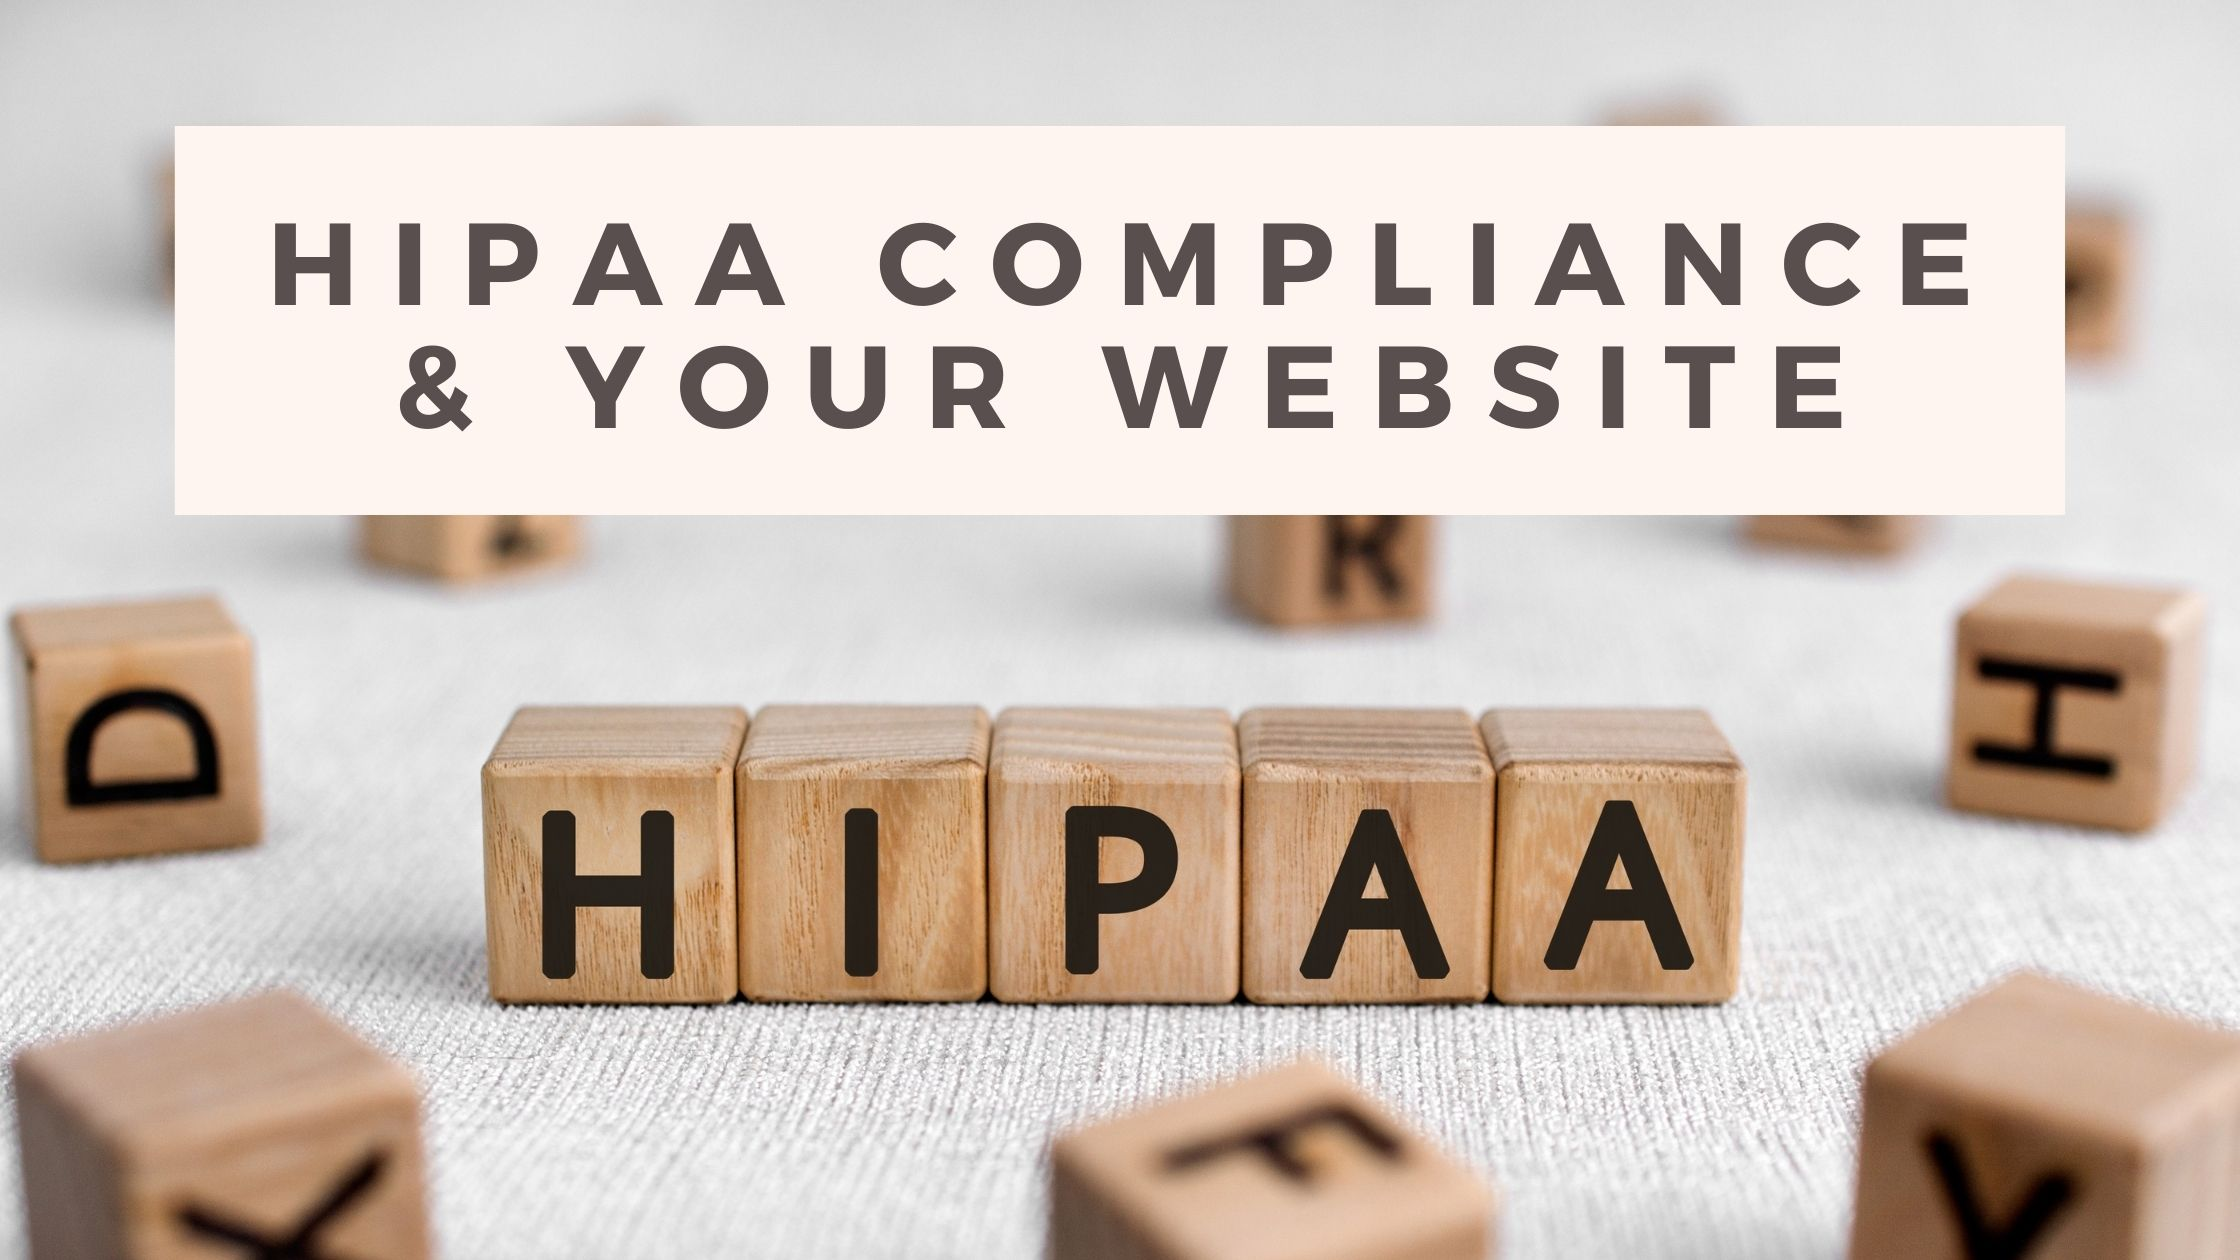 HIPAA Compliance & Your Website